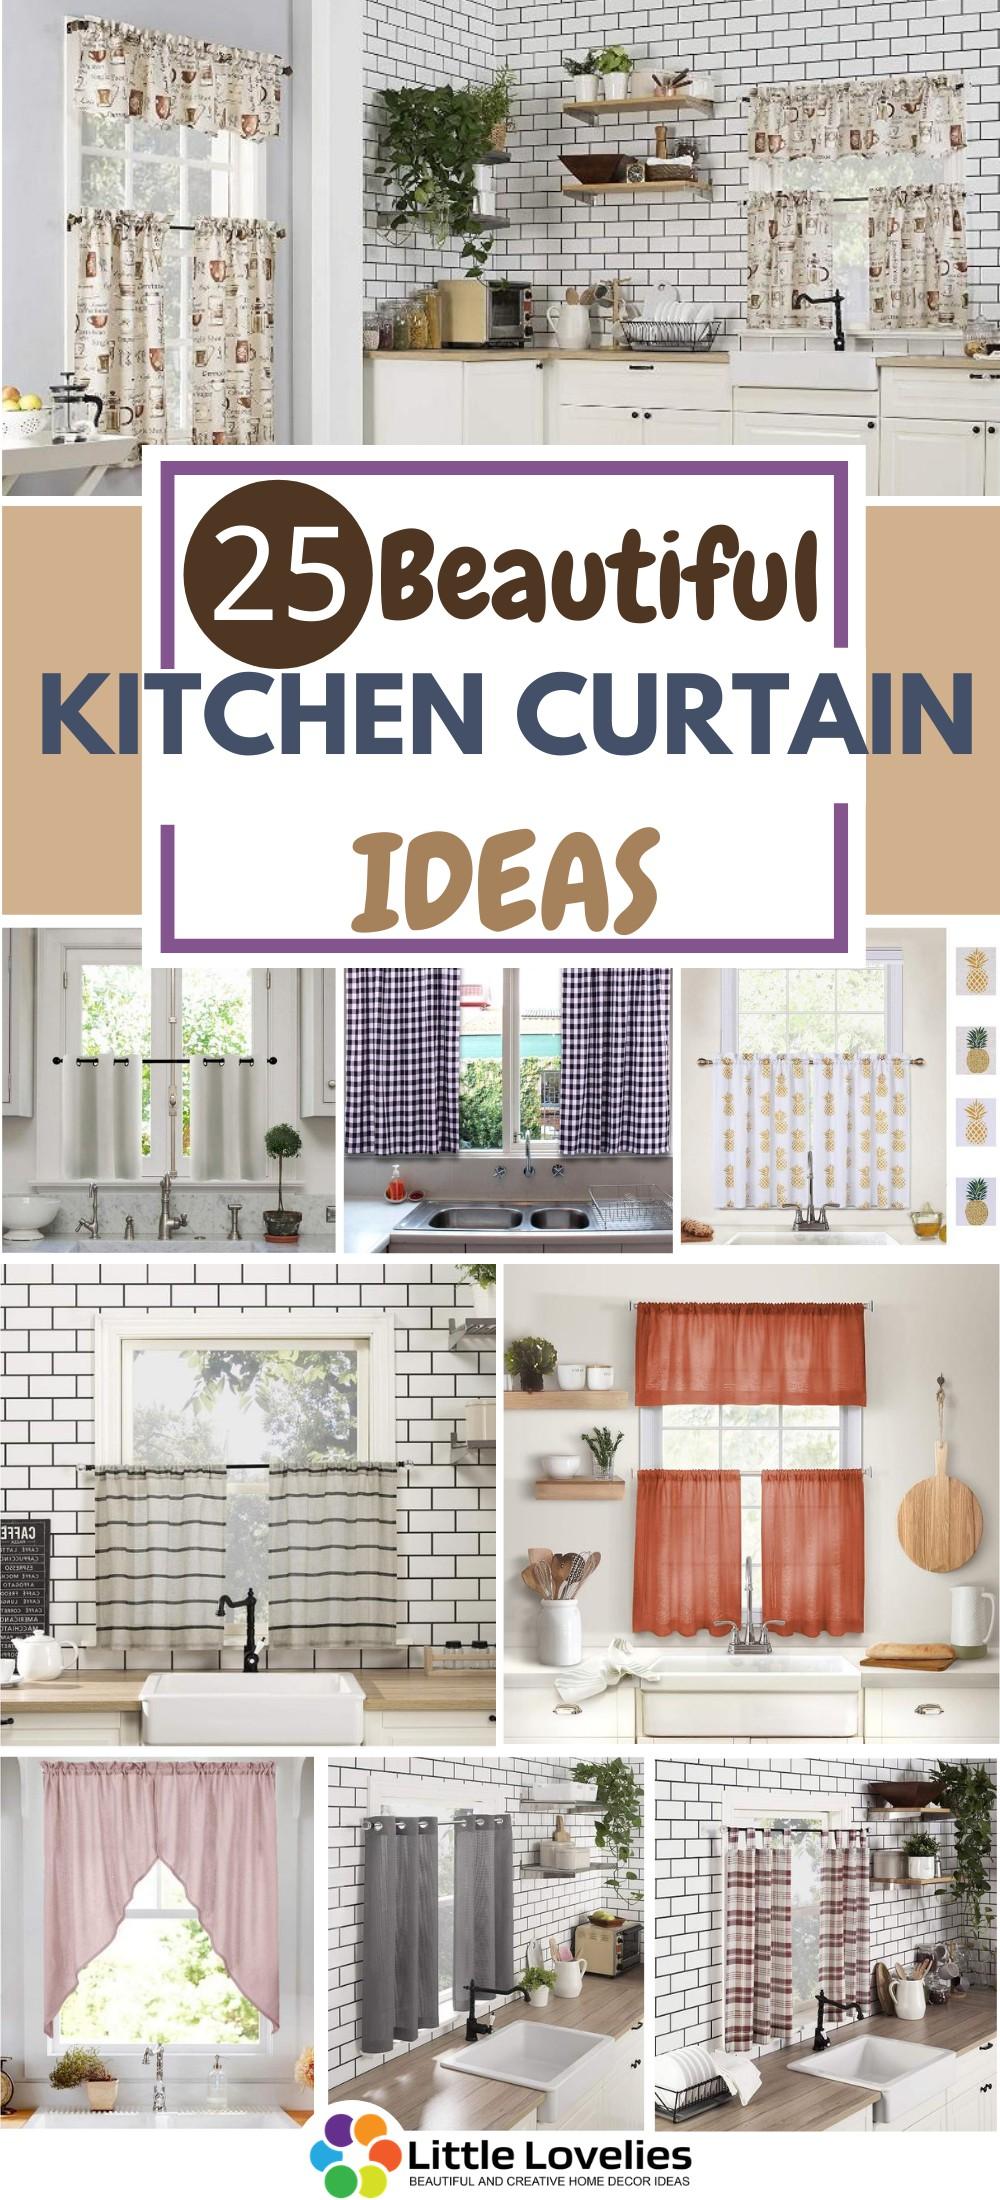 kitchen curtain ideas 2020 smart trik